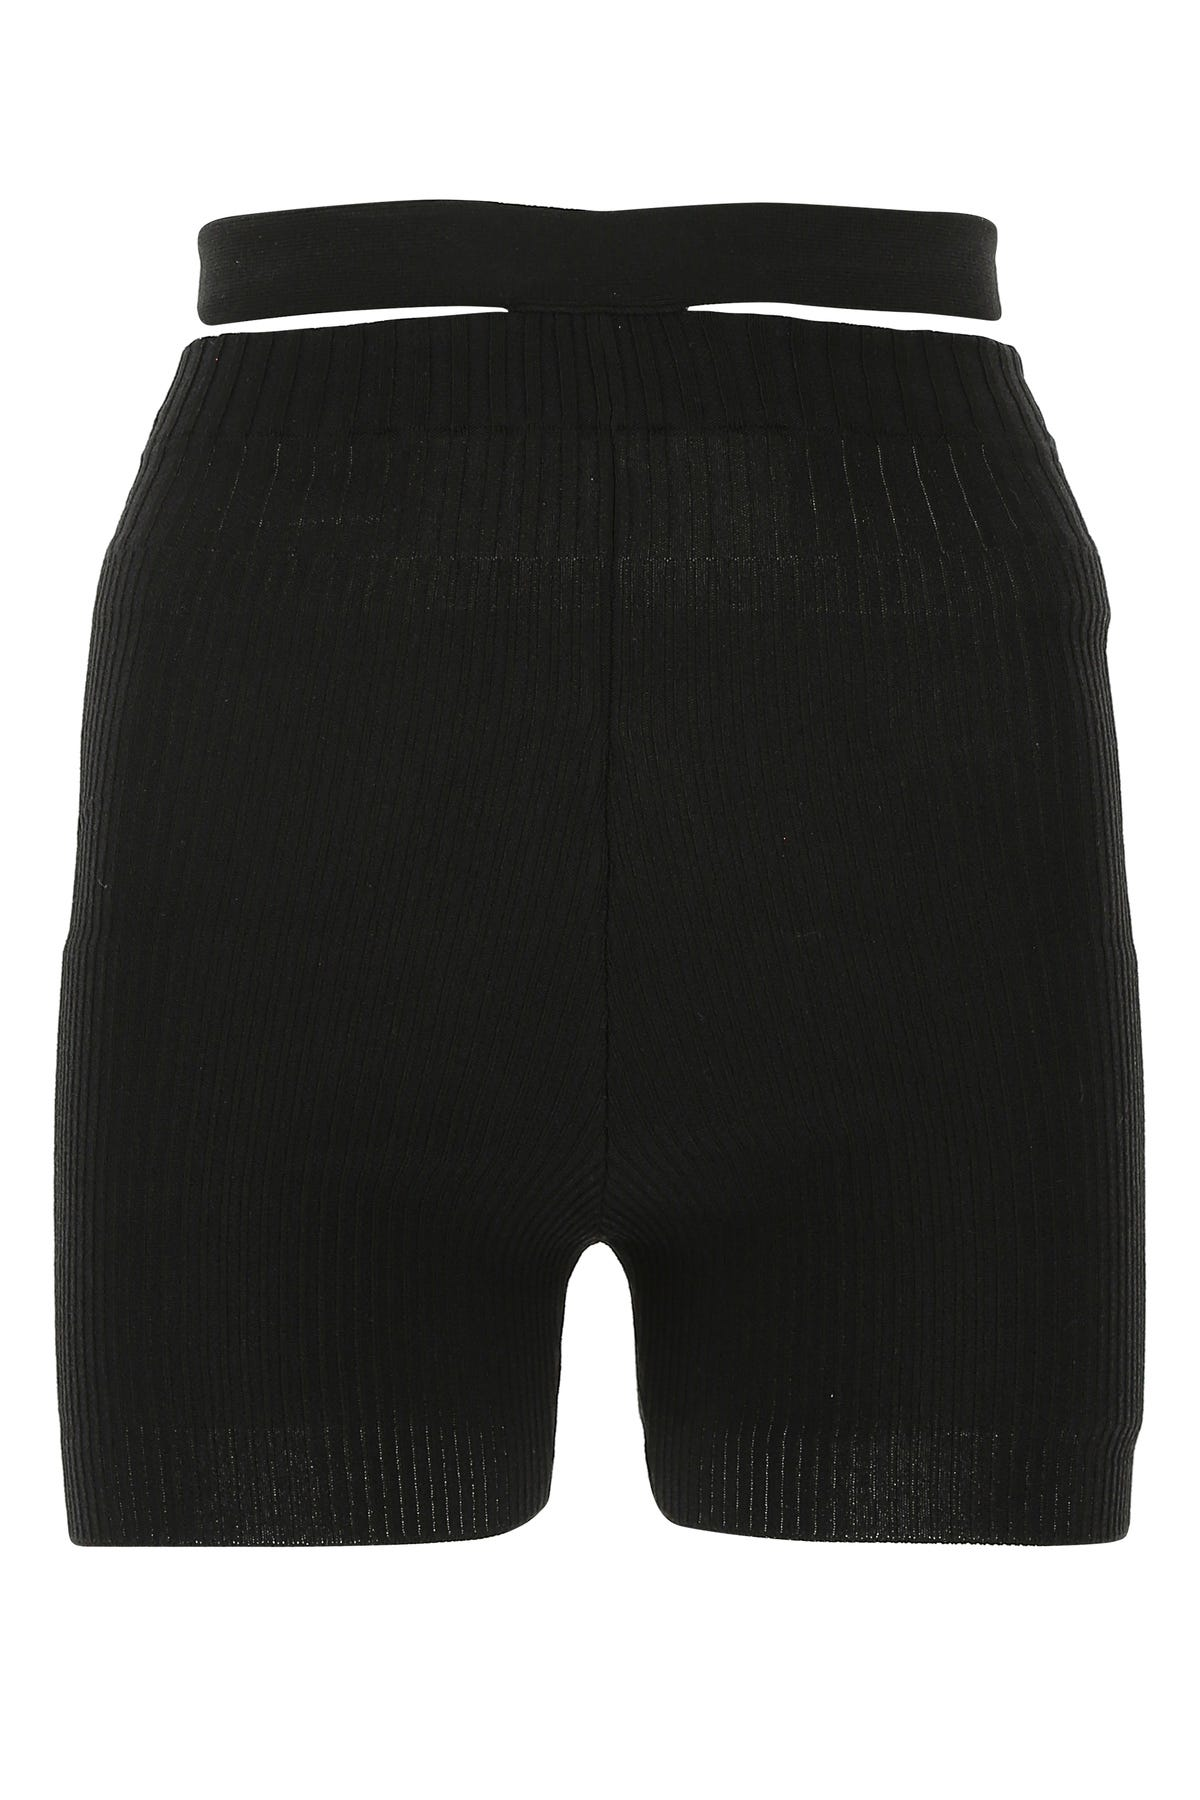 Adamo Black Stretch Viscose Blend Shorts  Black  Donna Xs